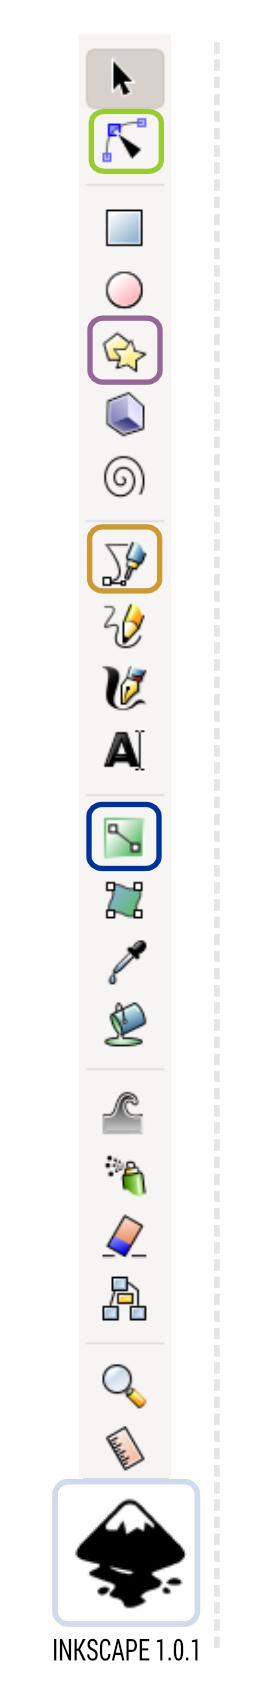 2Dgameartguru inkscape toolbar